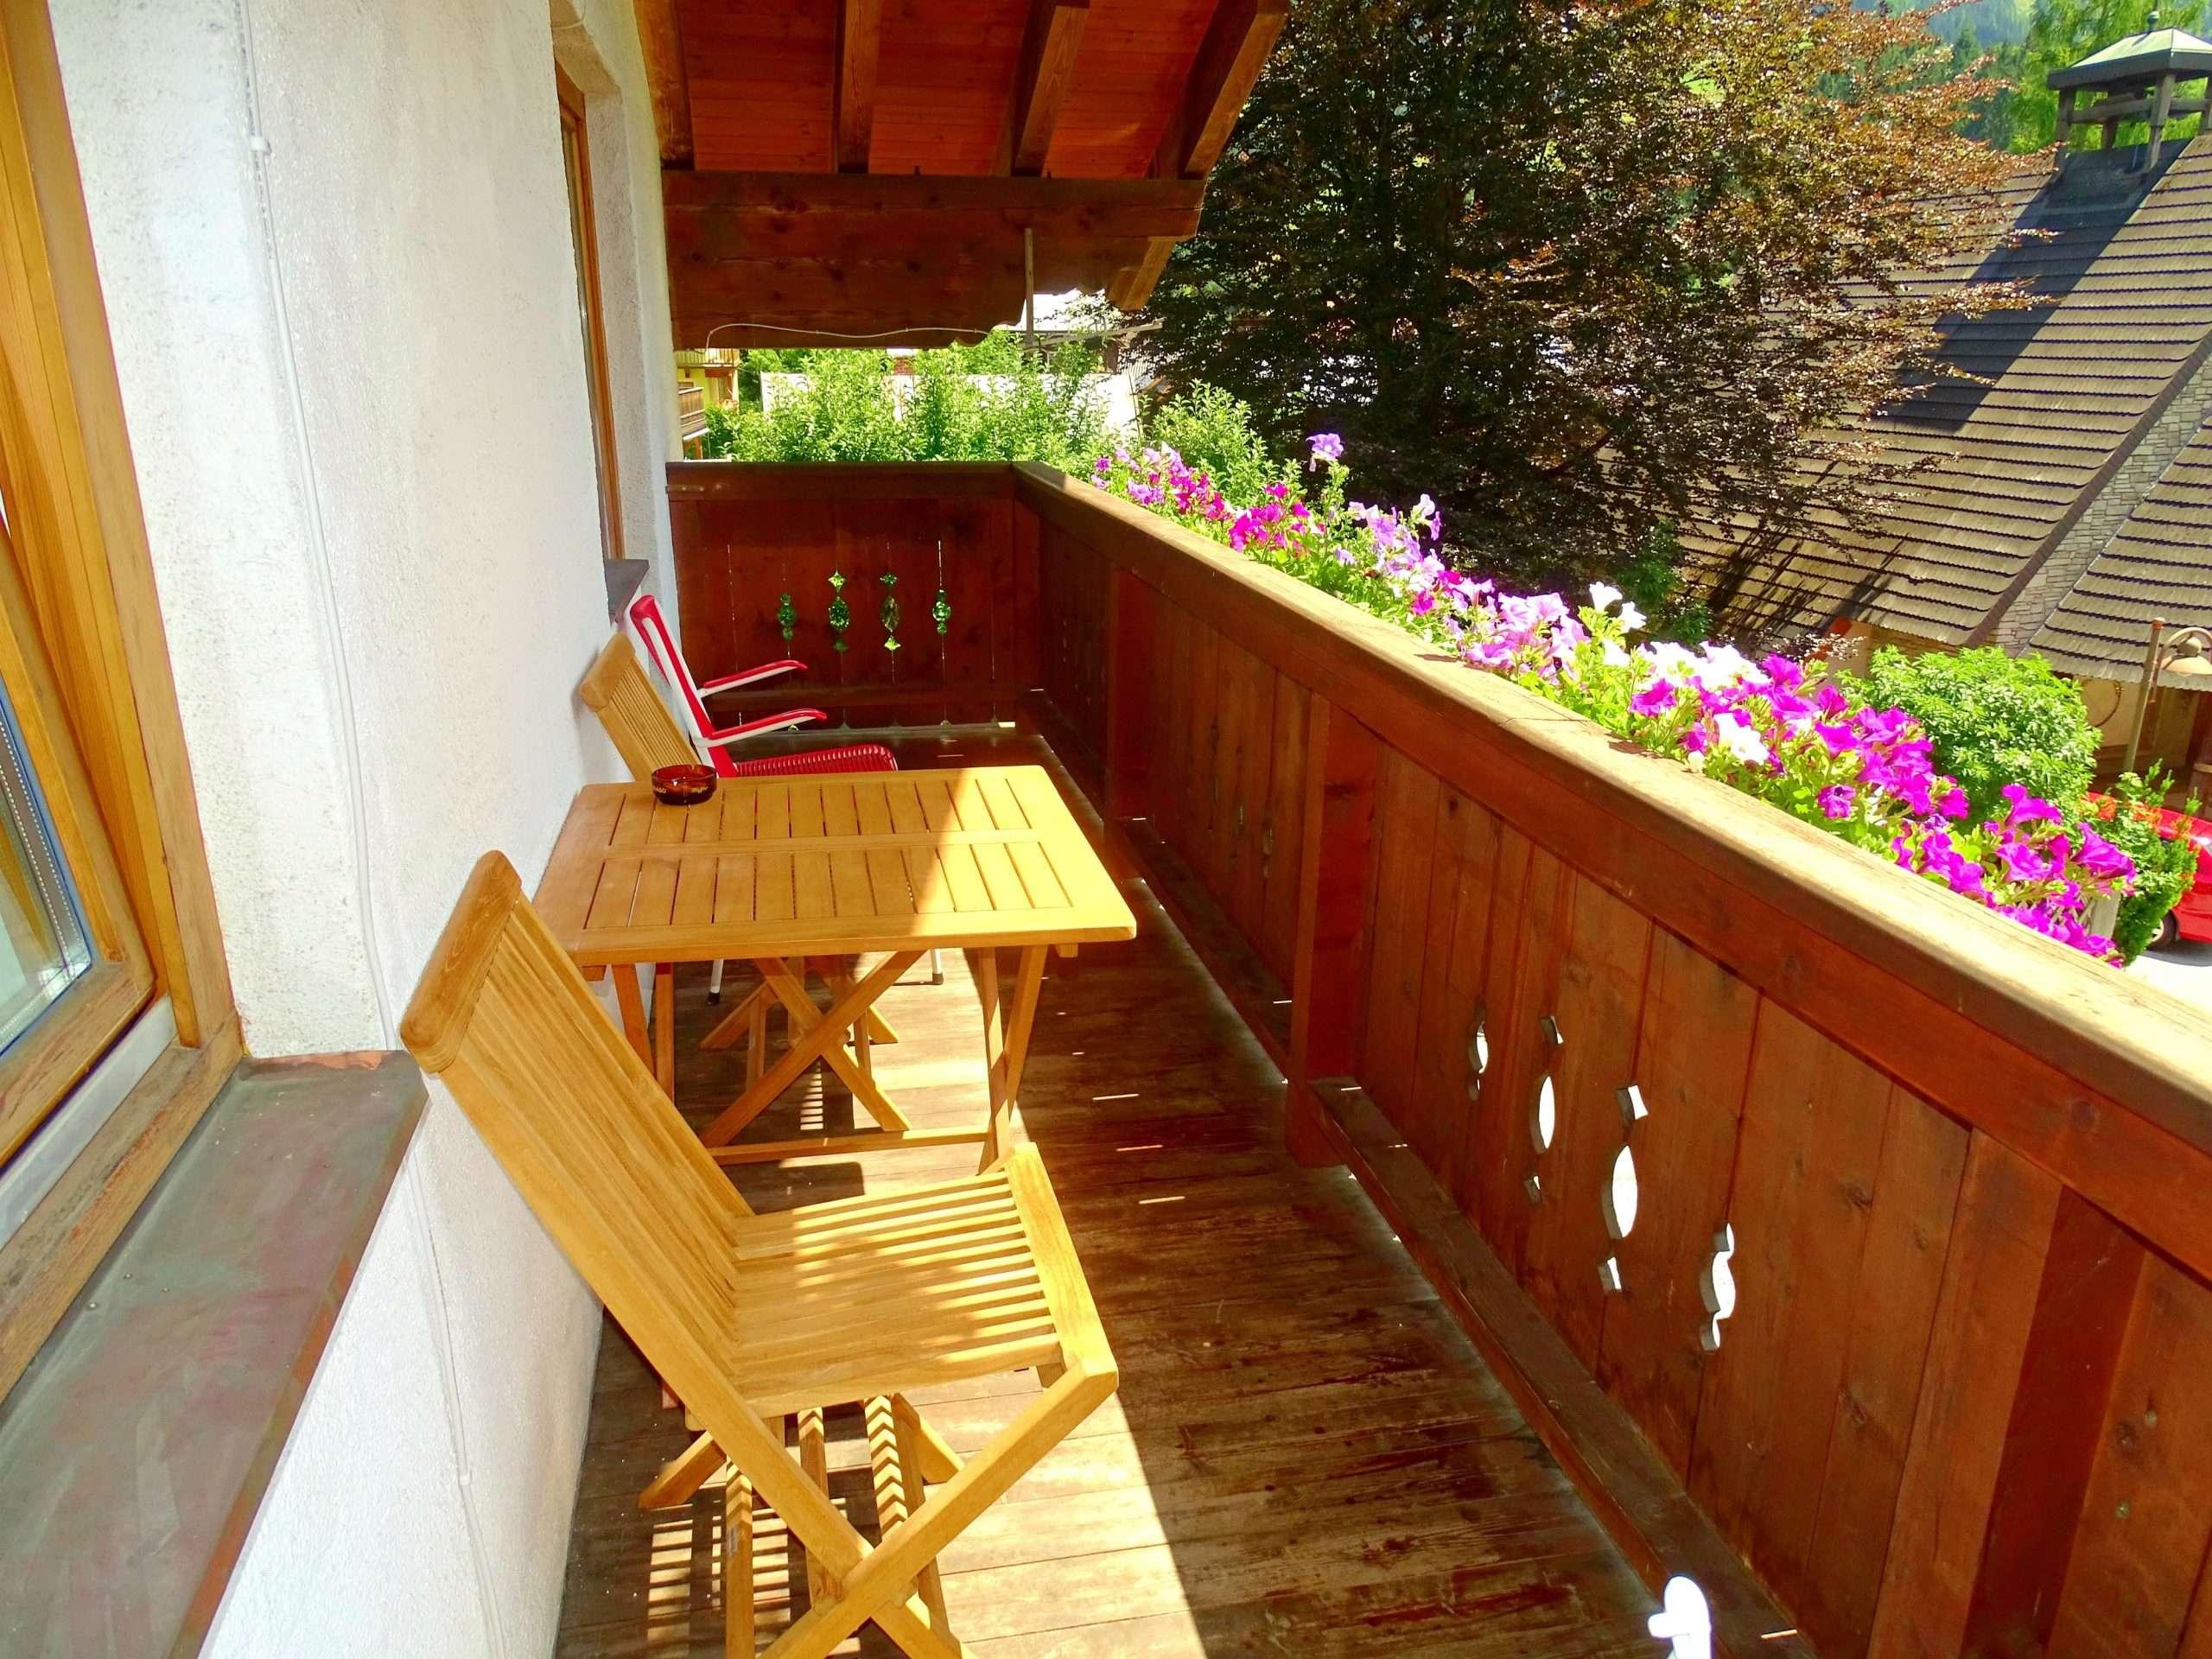 Hochkeil balcony Haus Schneeberg. Hochkoenig